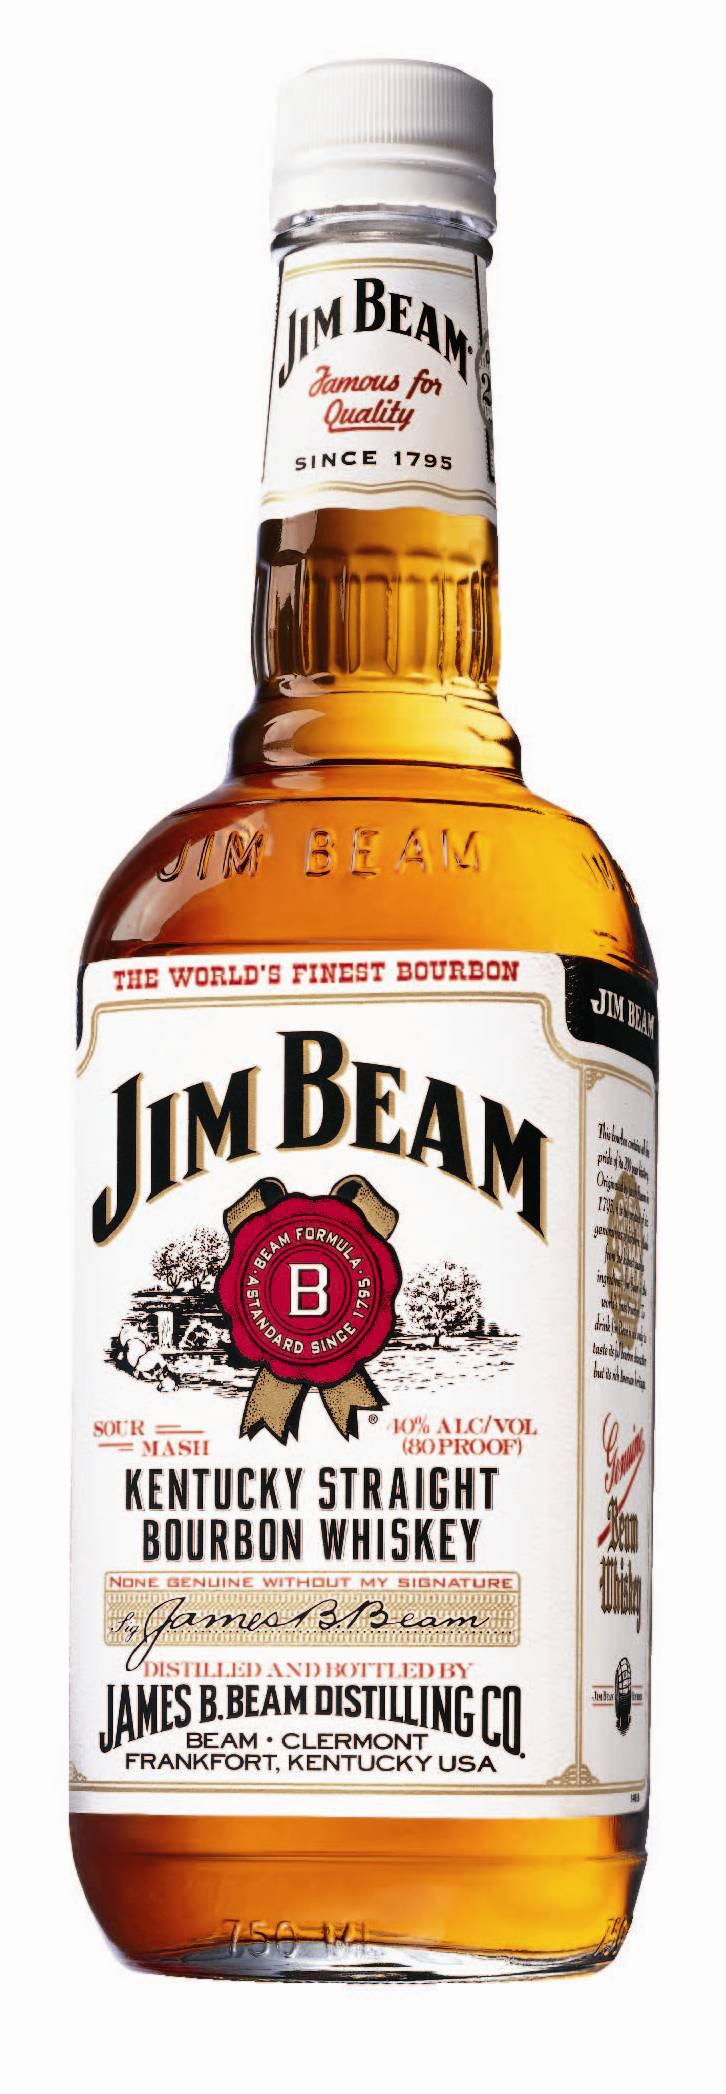 Bourbon Jeam Beam 1 L. - 40% sur carte Waaohhhhh ! Soit